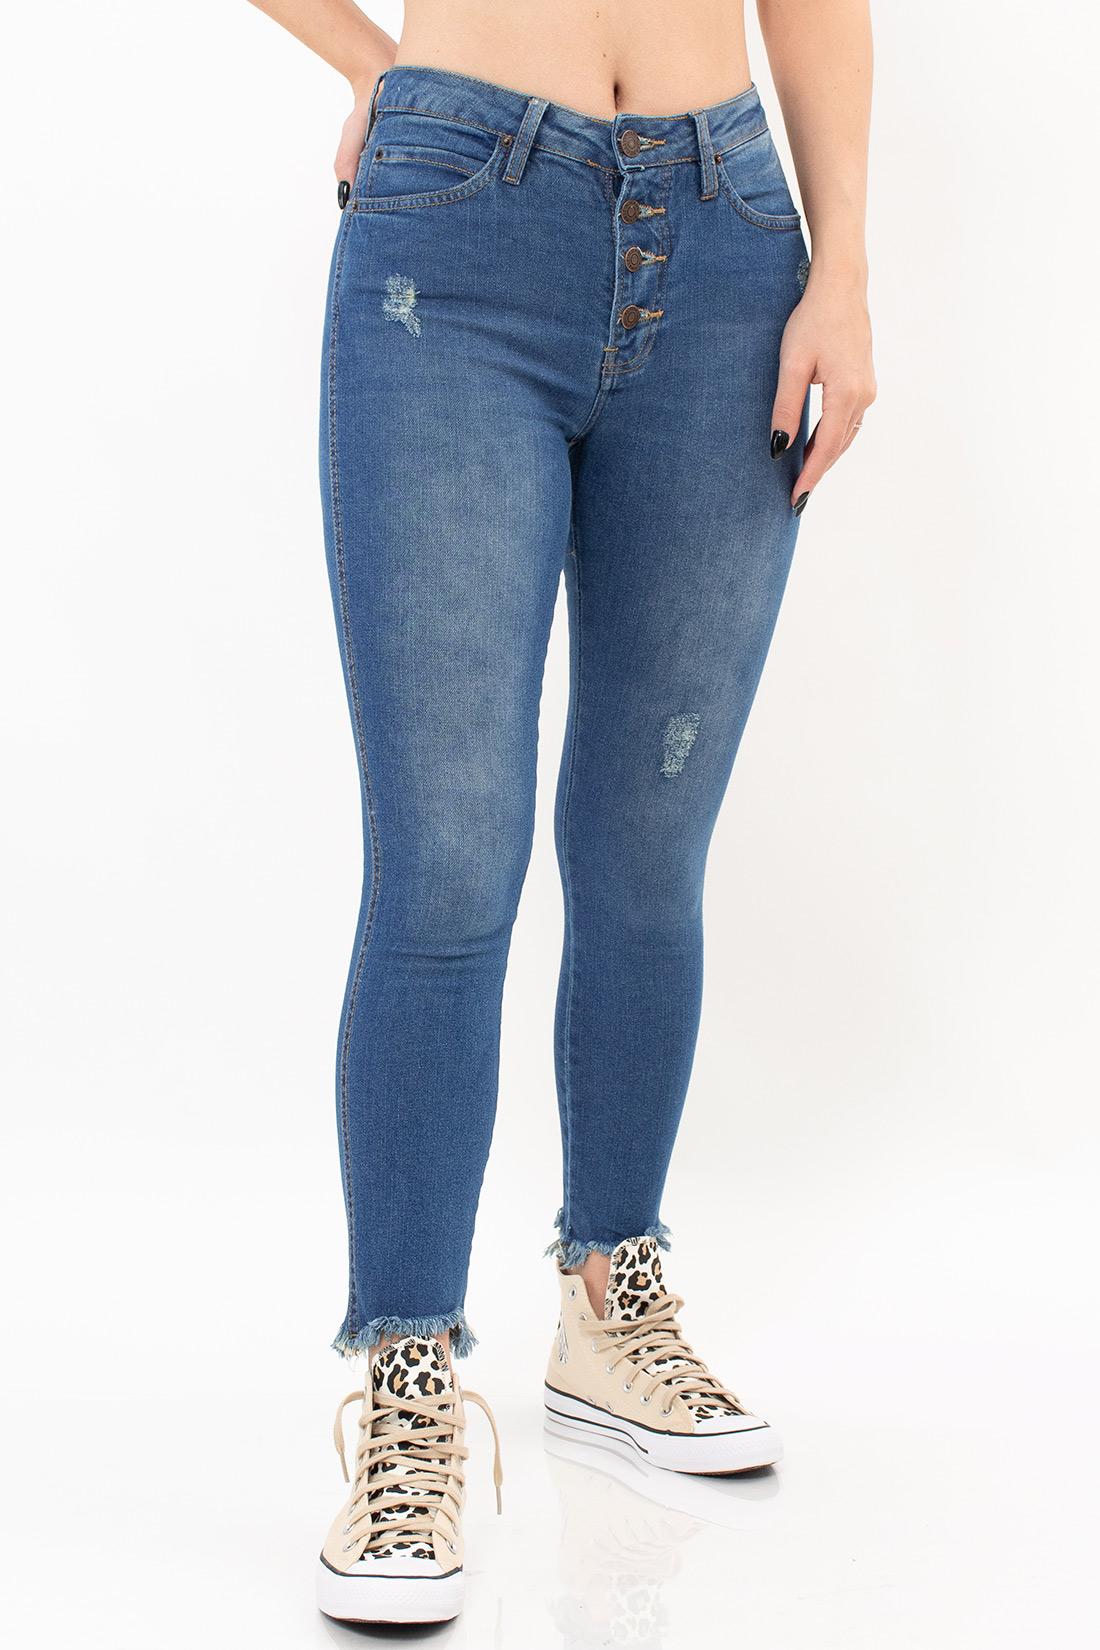 Calca Jeans Calvin Klein High Rise Skinny Botoes